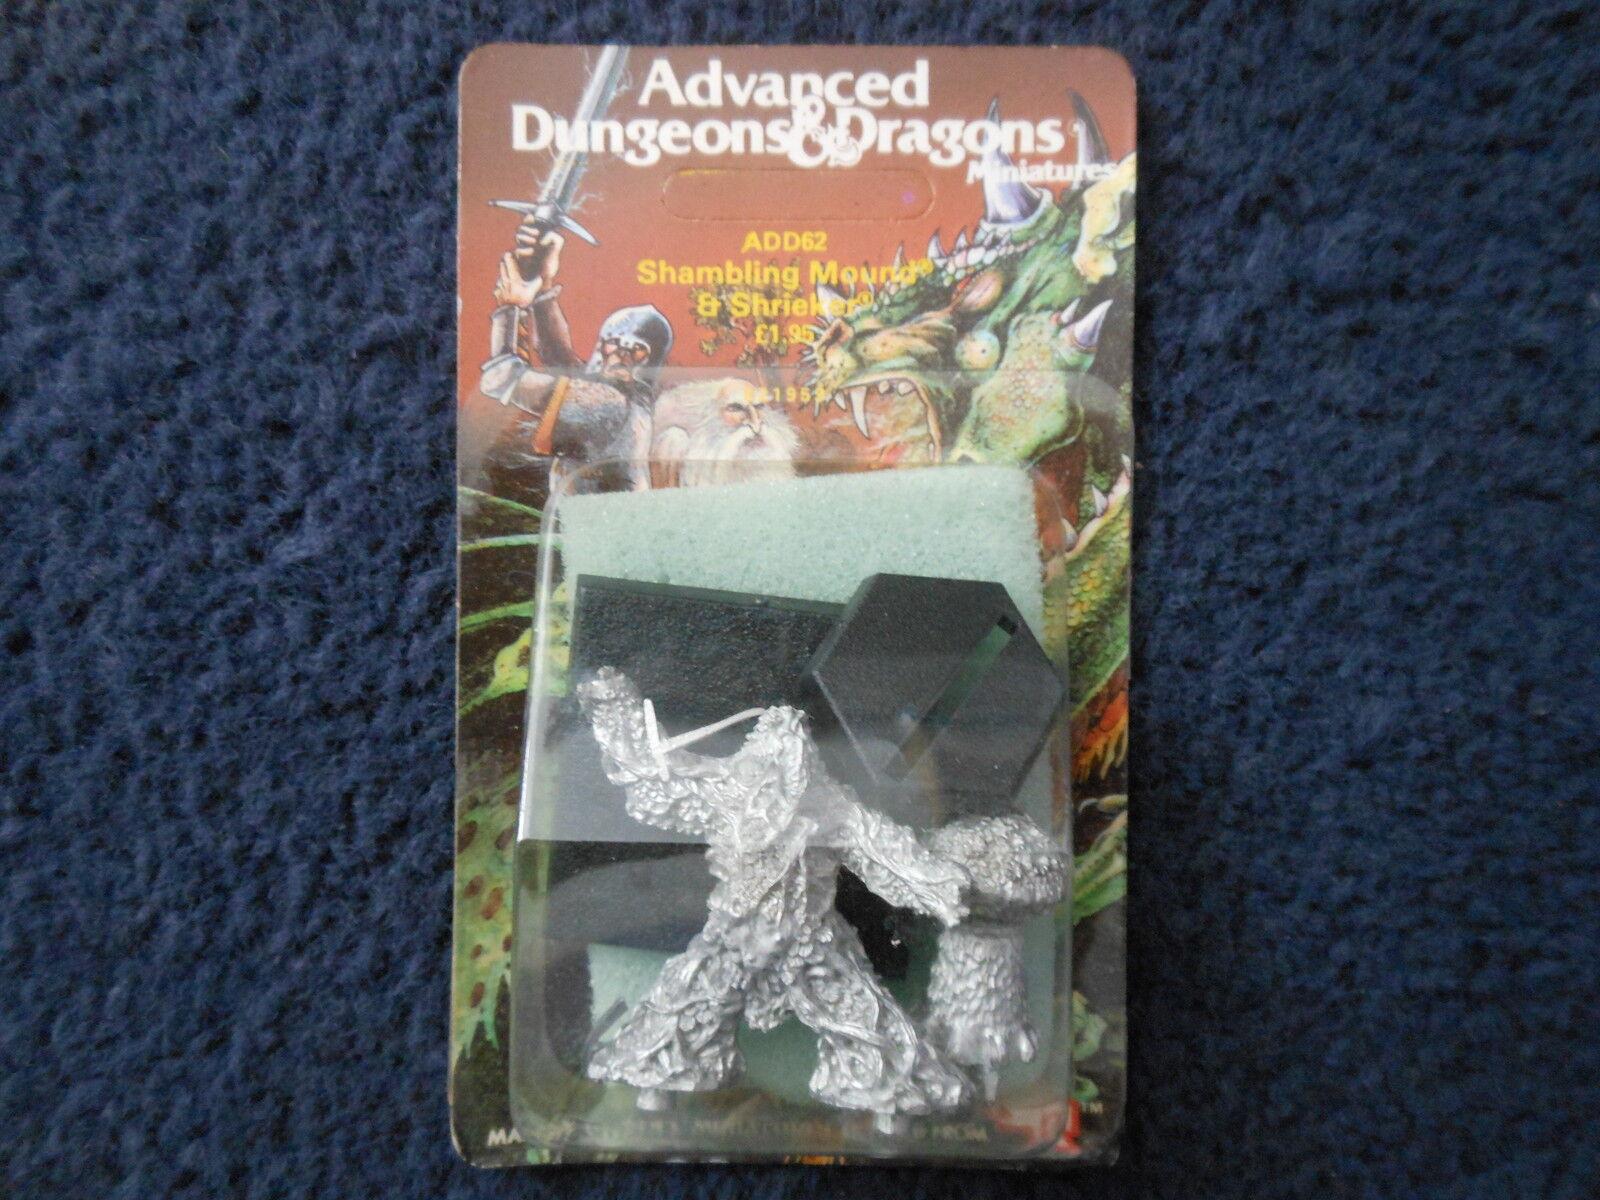 1985 ADD62 Shambling Mound & Shrieker A Advanced Dungeons & Dragons Citadel MIB